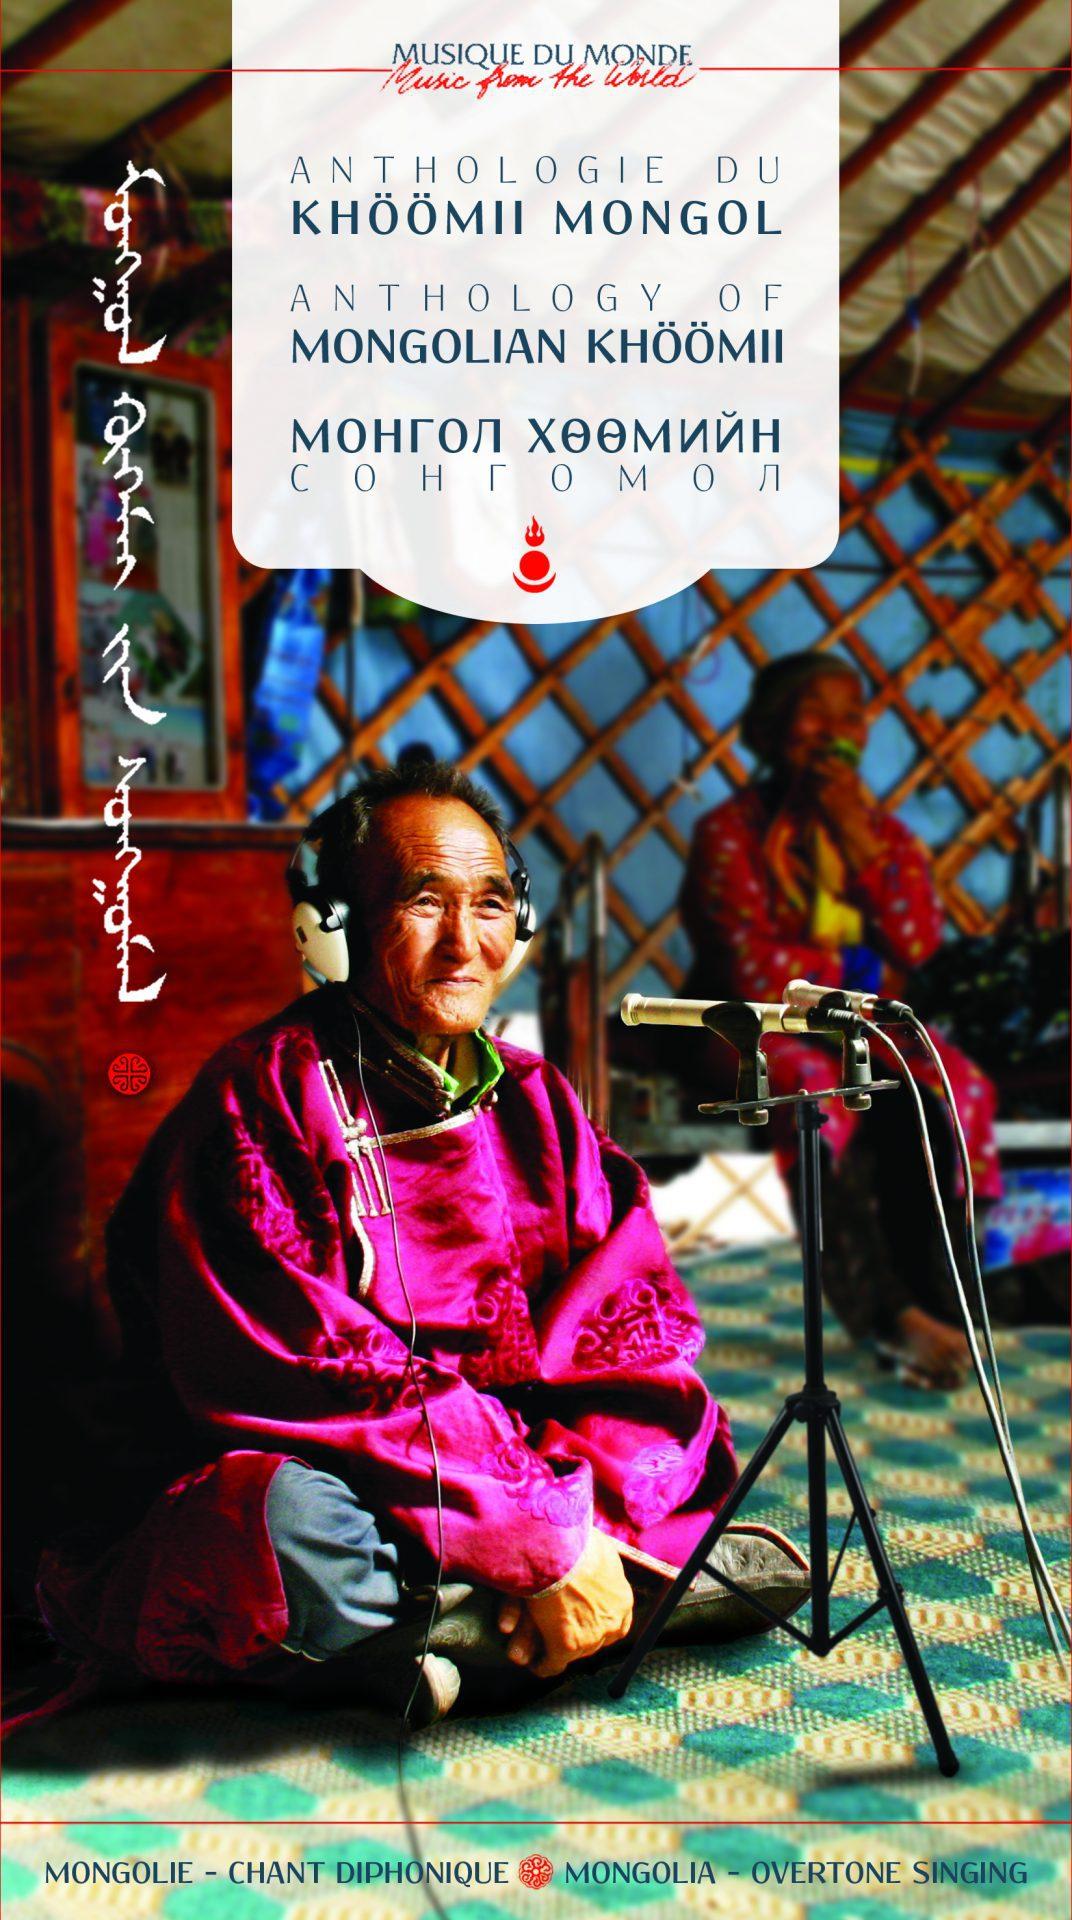 Anthologie Du Khömii Mongol